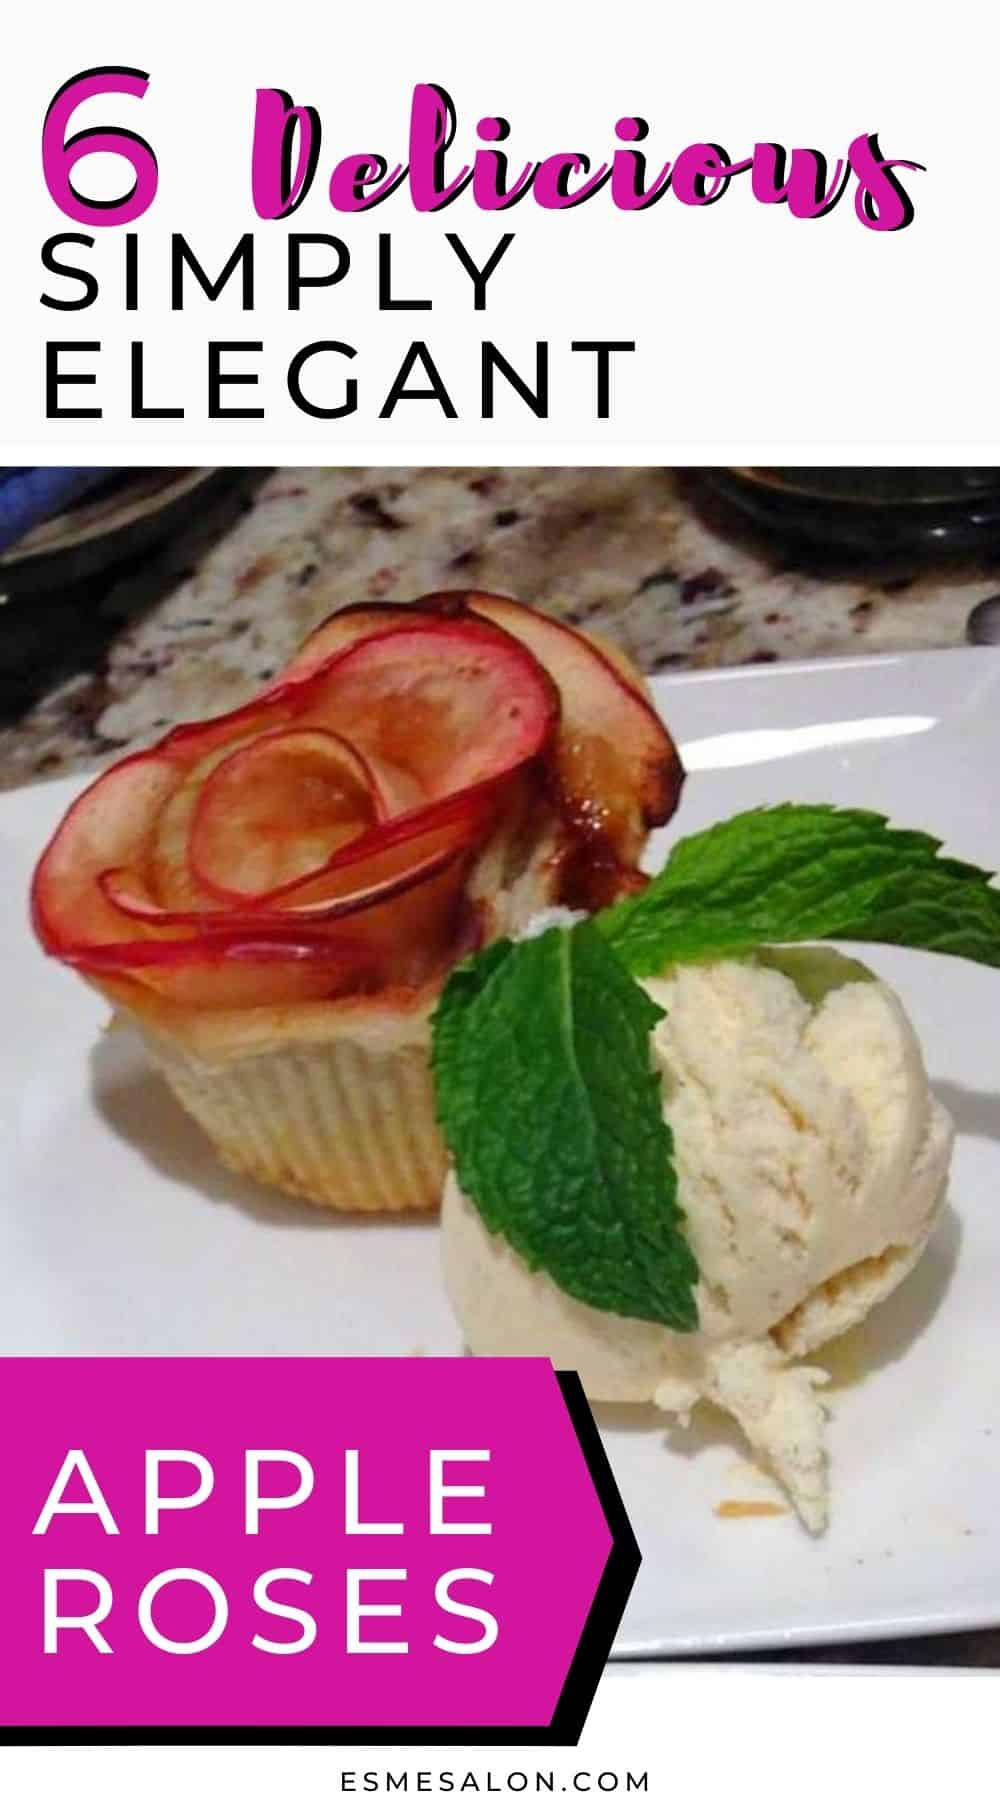 Apple Roses Simply Elegant as Dessert